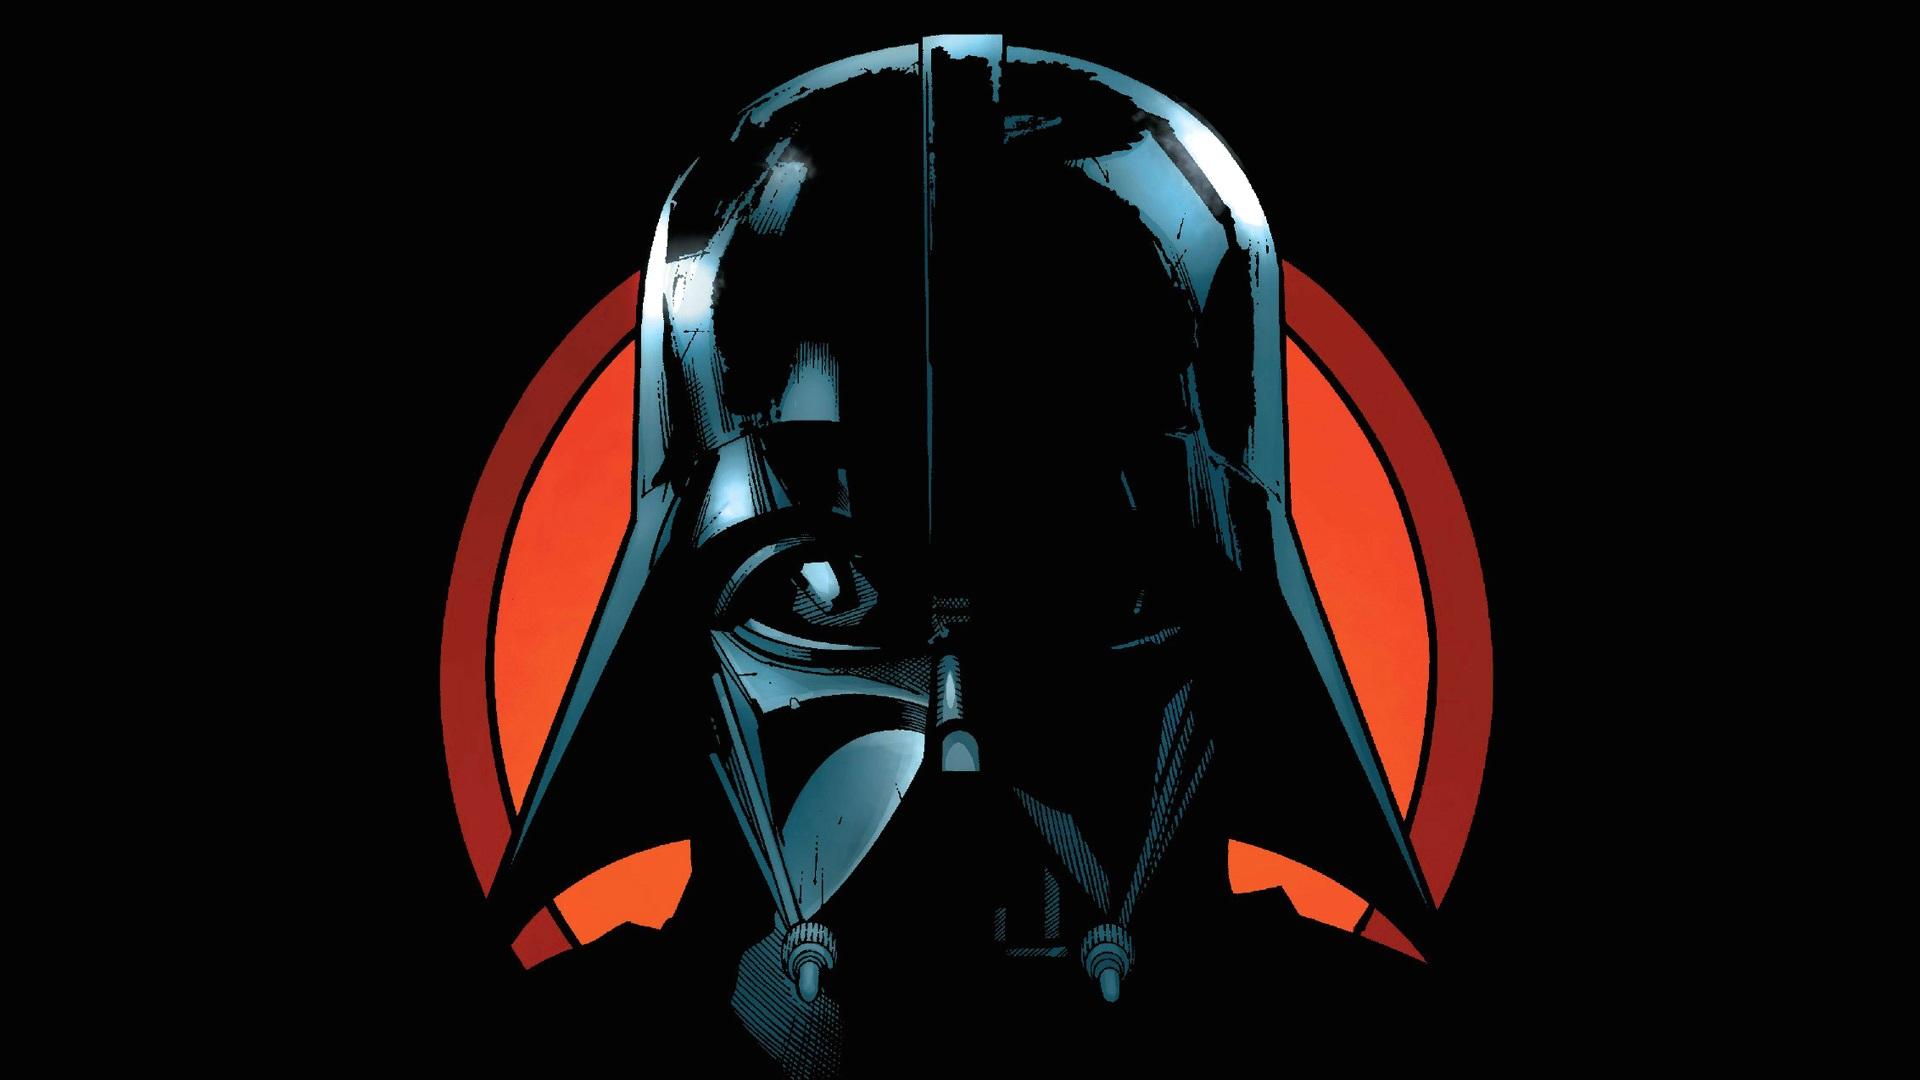 Wallpaper Star Wars, Darth Vader, art picture 1920x1080 Full